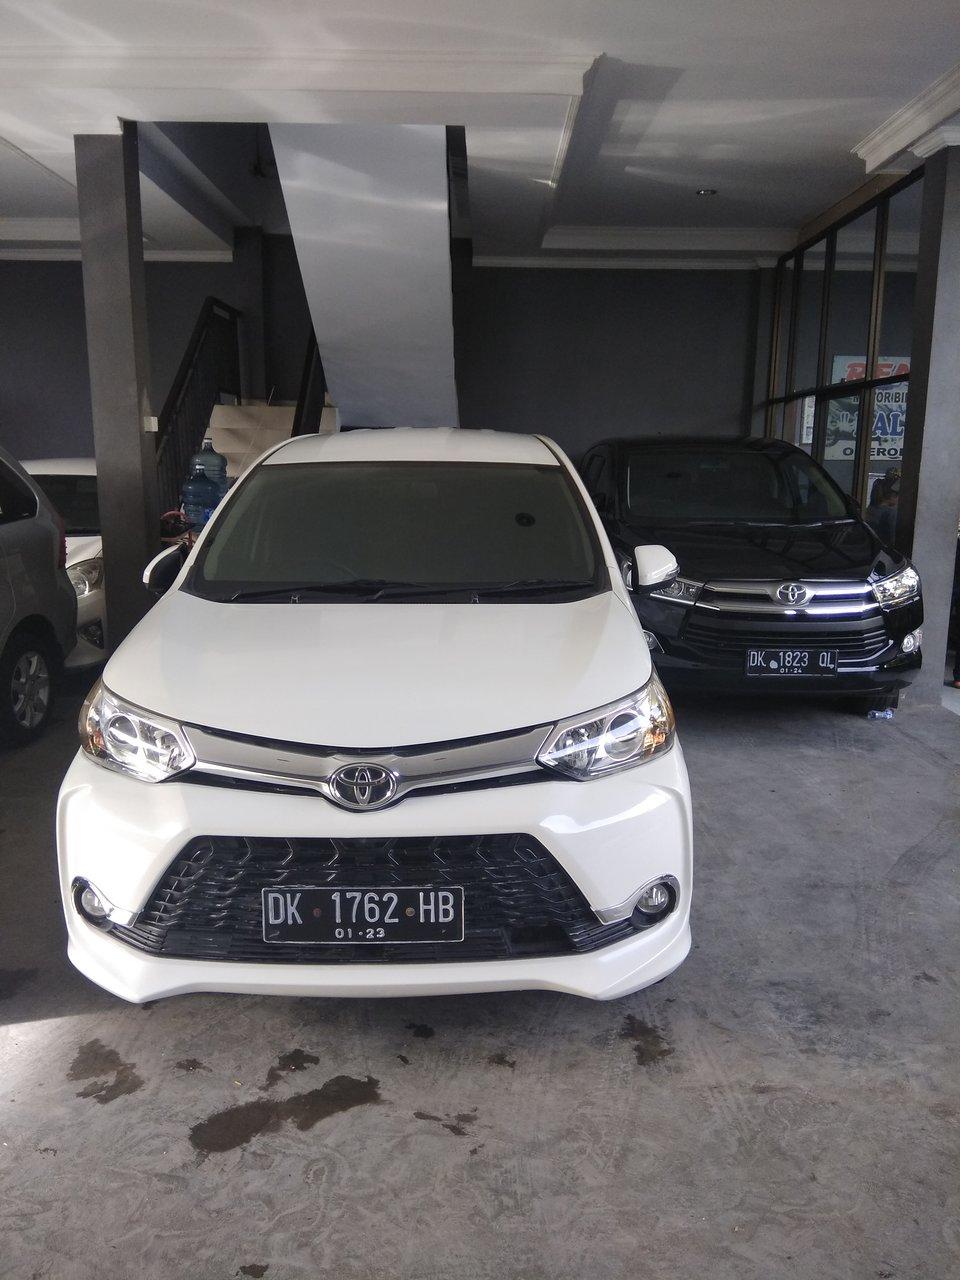 Bali Mutia Car Rental (Kerobokan) - 2019 All You Need to